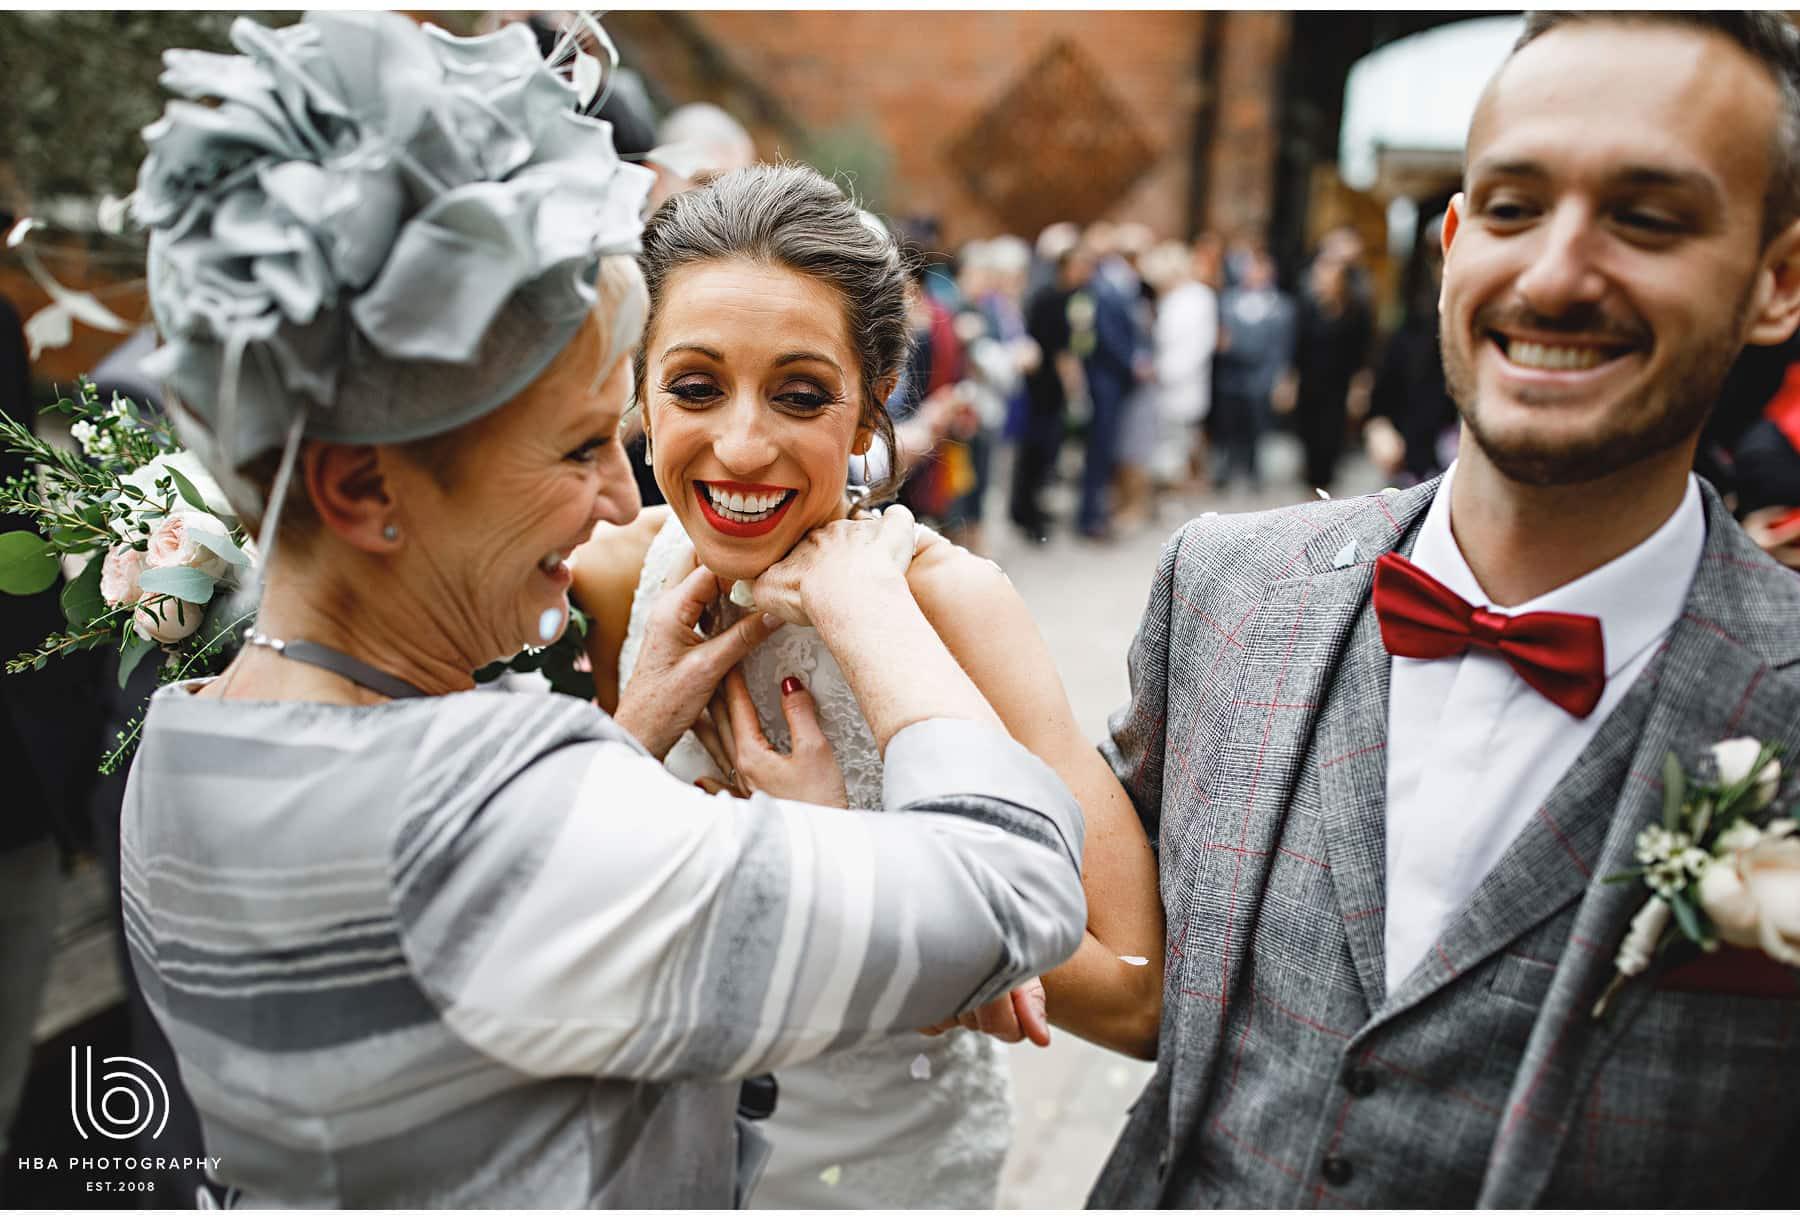 the bride's mum putting confetti down the bride's dress